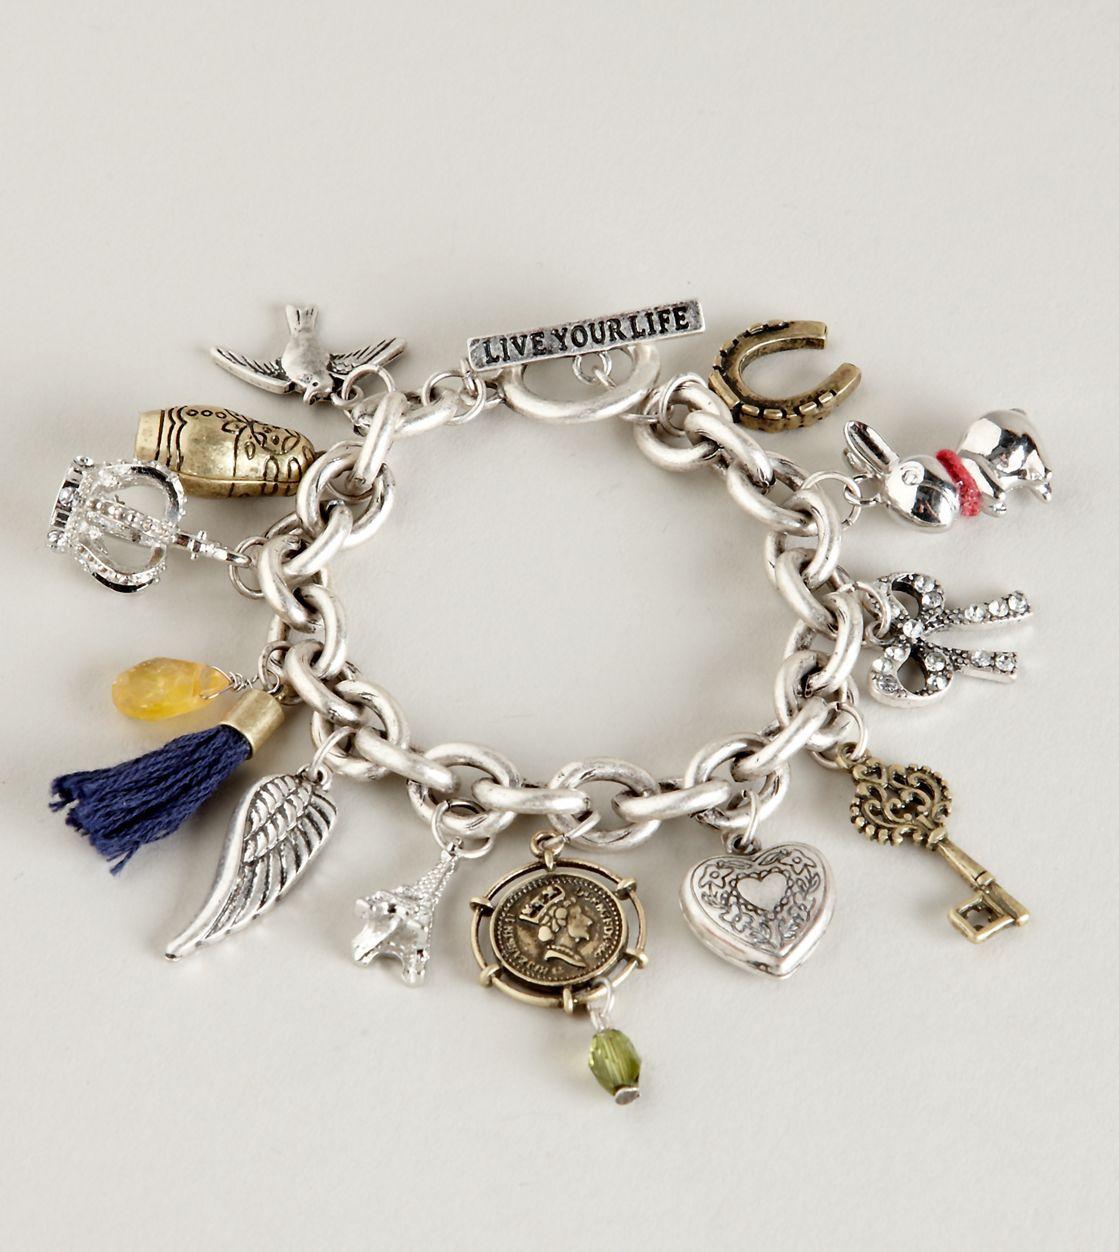 Bone hand bracelet erin wasson hand bracelet and chains